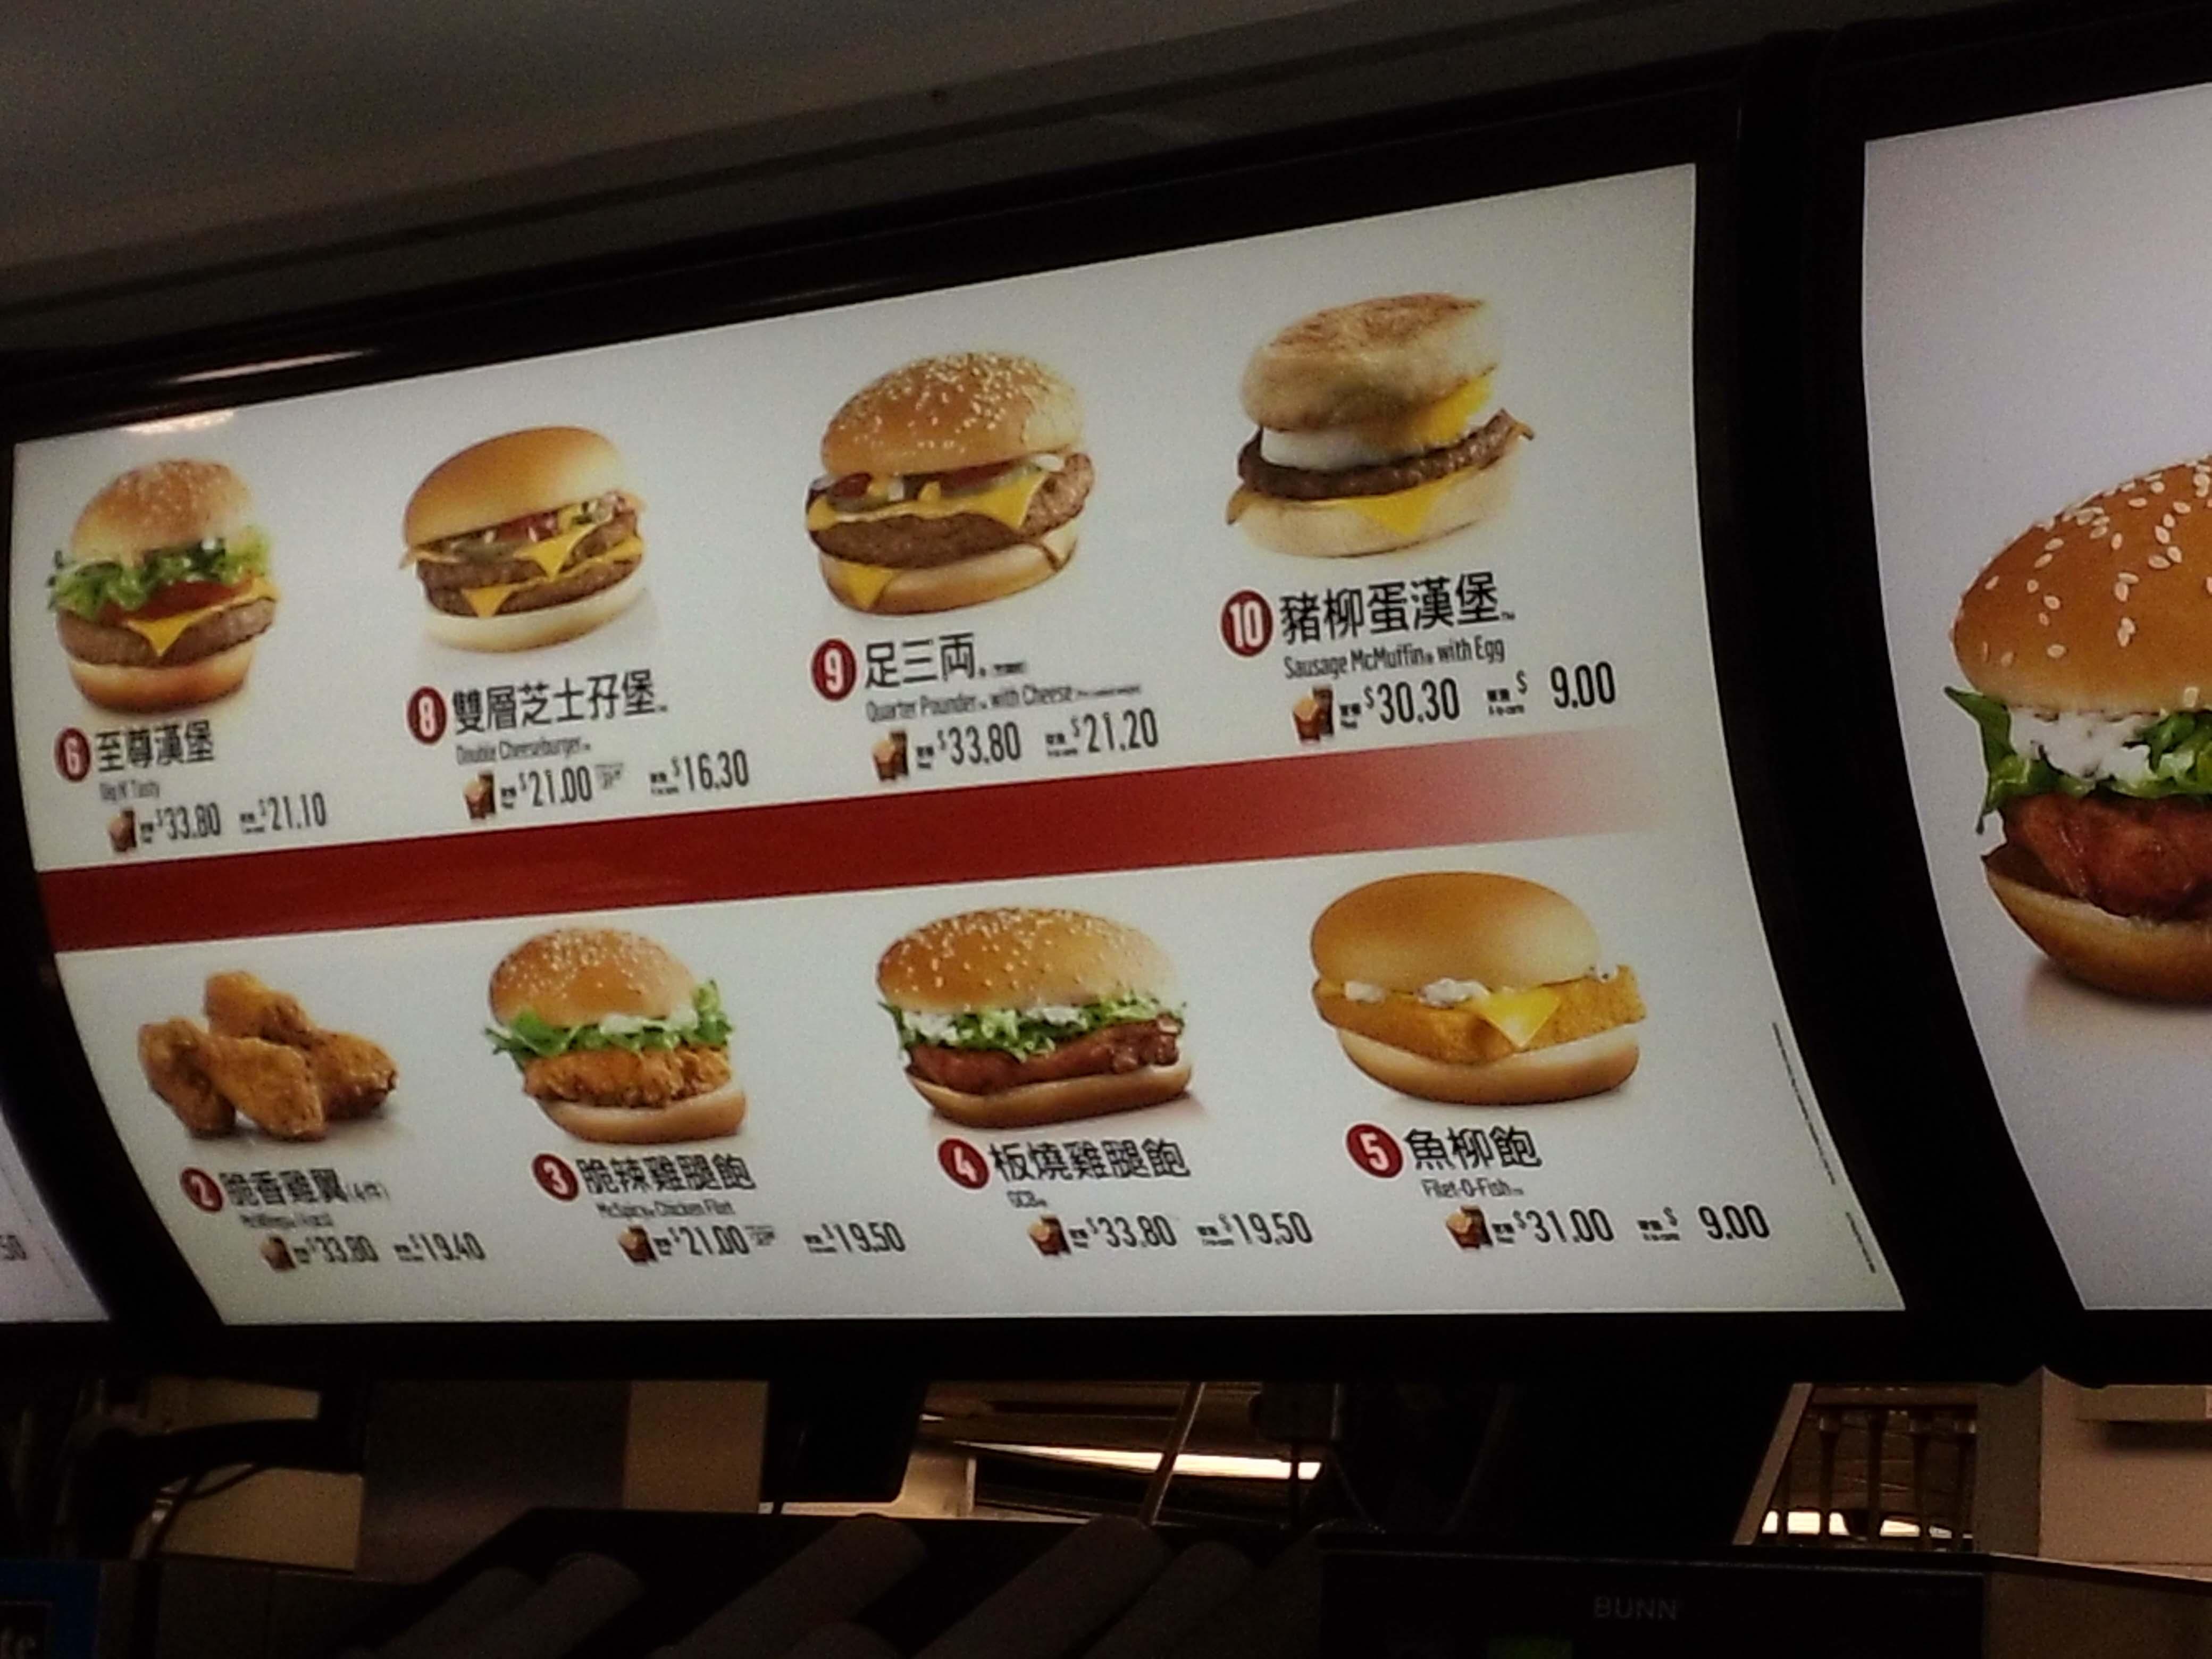 麥當勞改價 2014 | journal@ticoneva.com